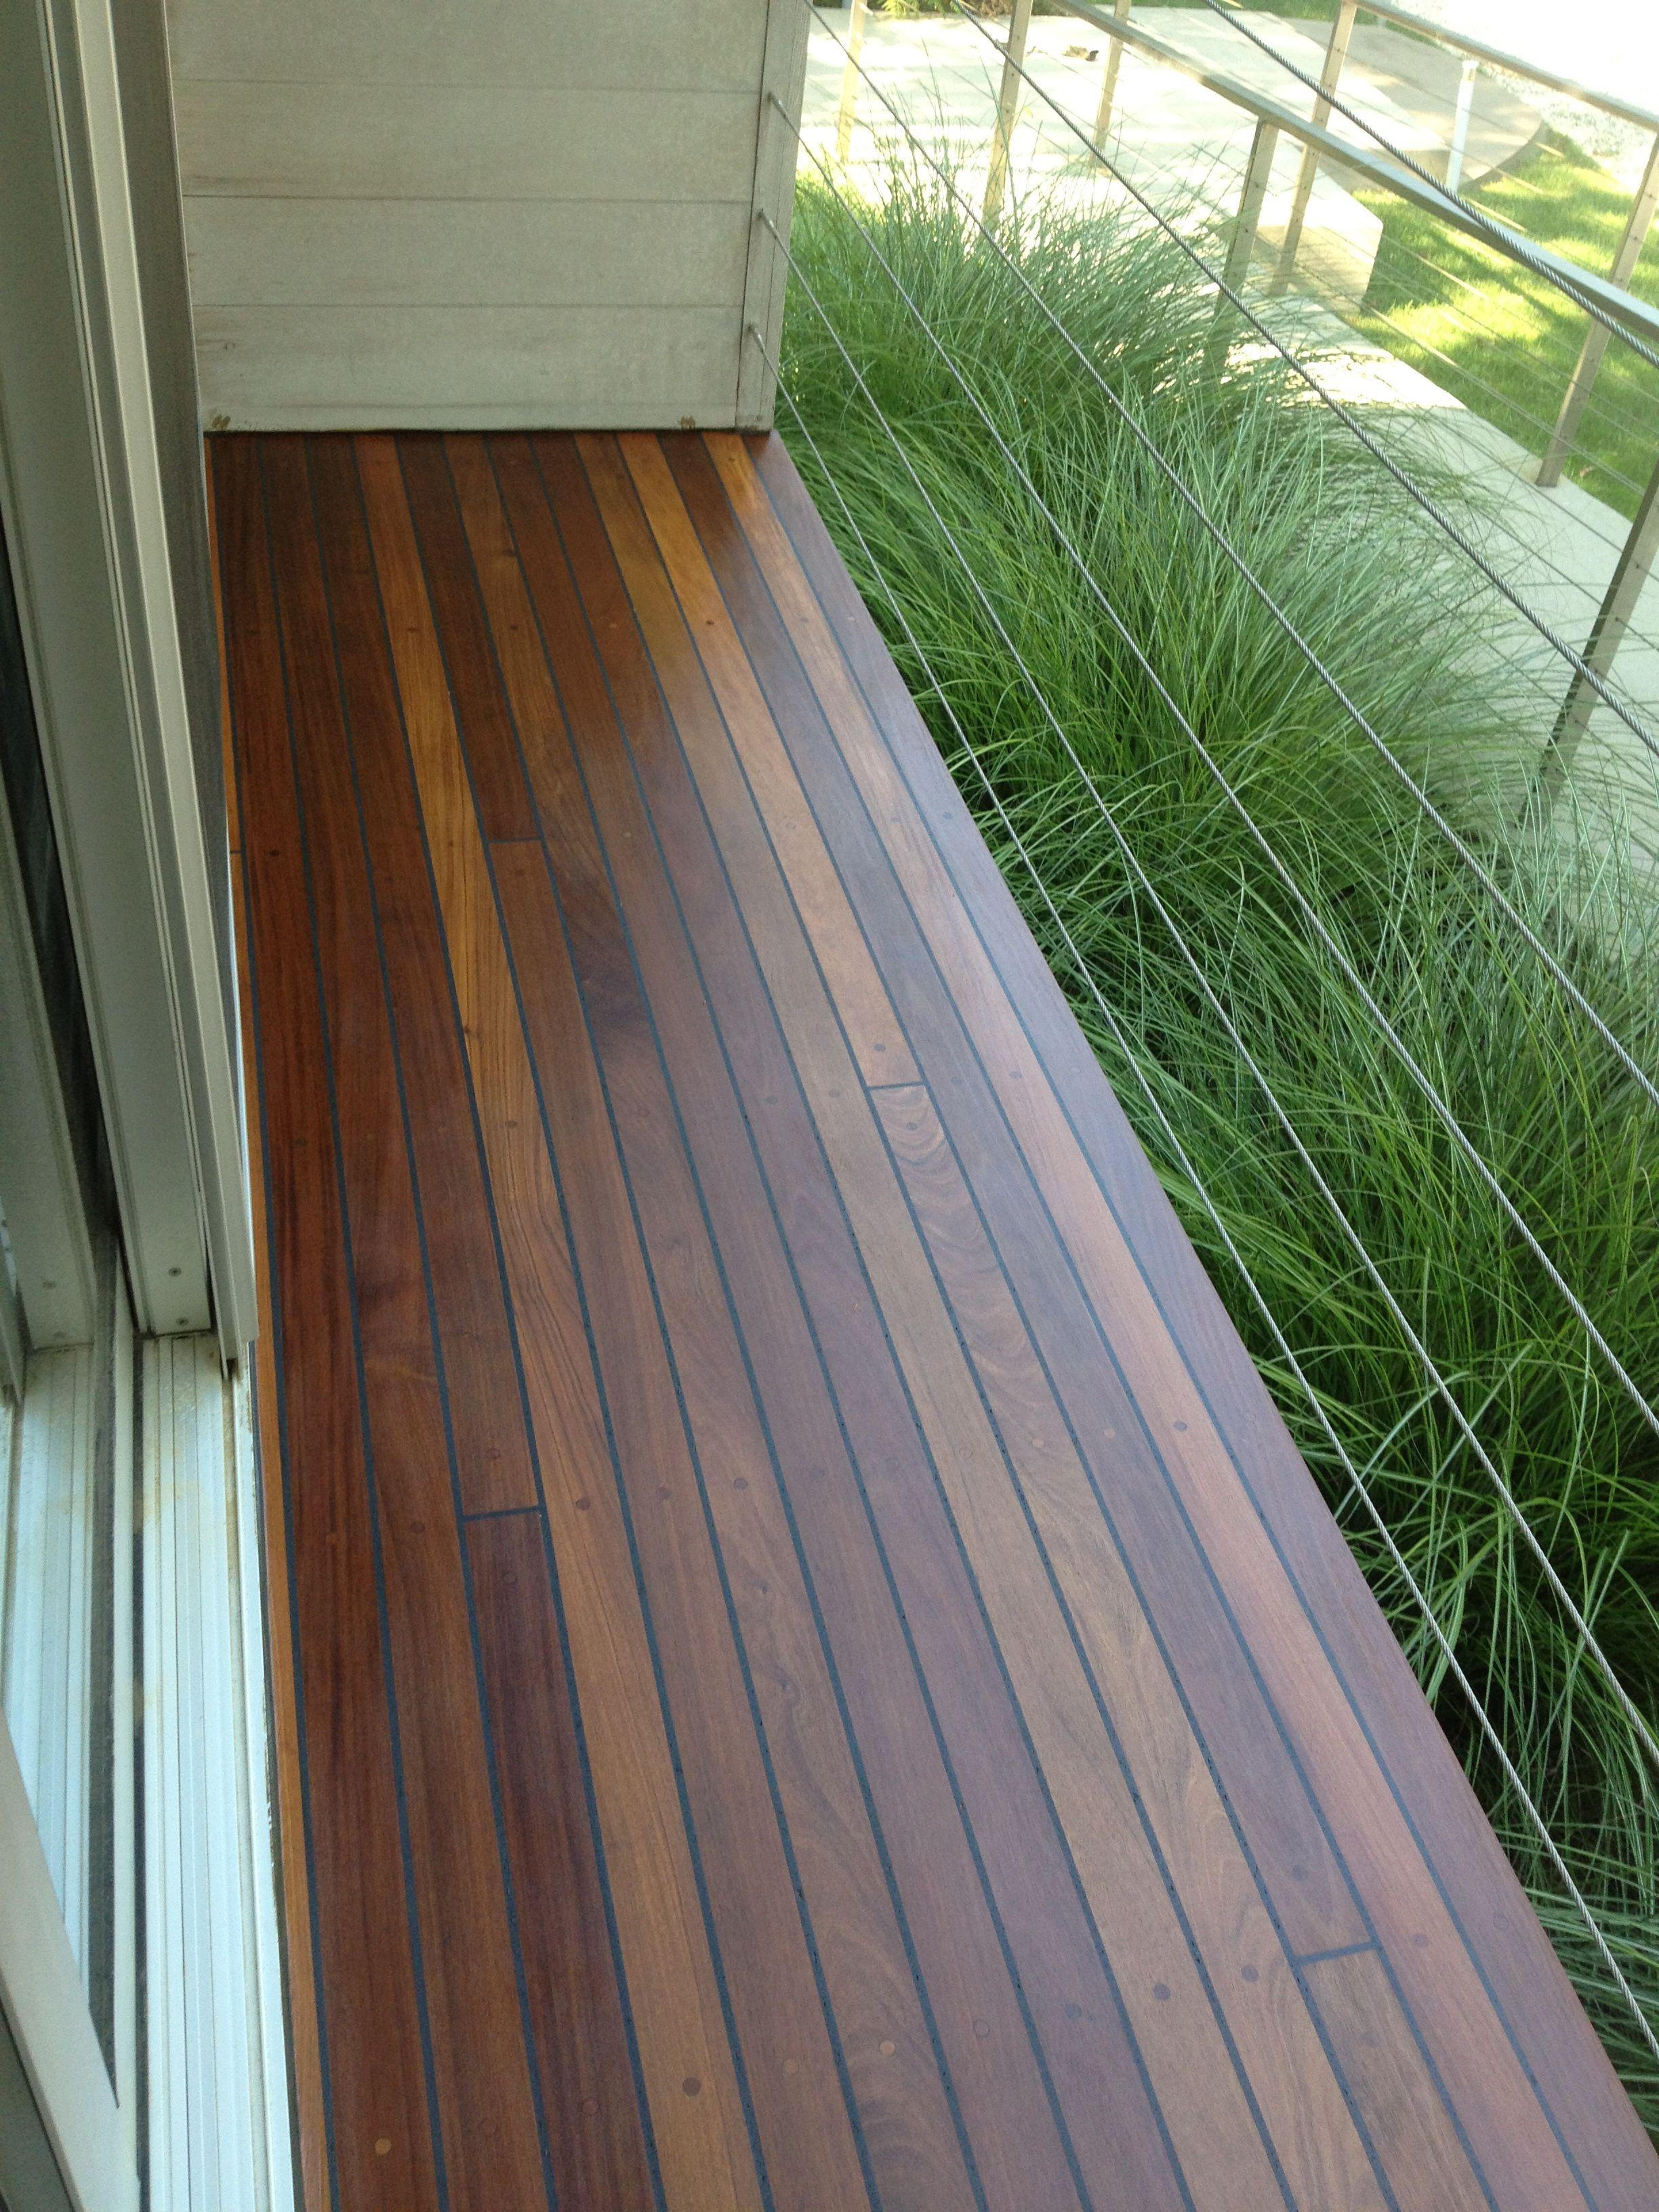 Restored Brazilian Teak Deck Hardwood Decking Wood Floors Deck Restoration